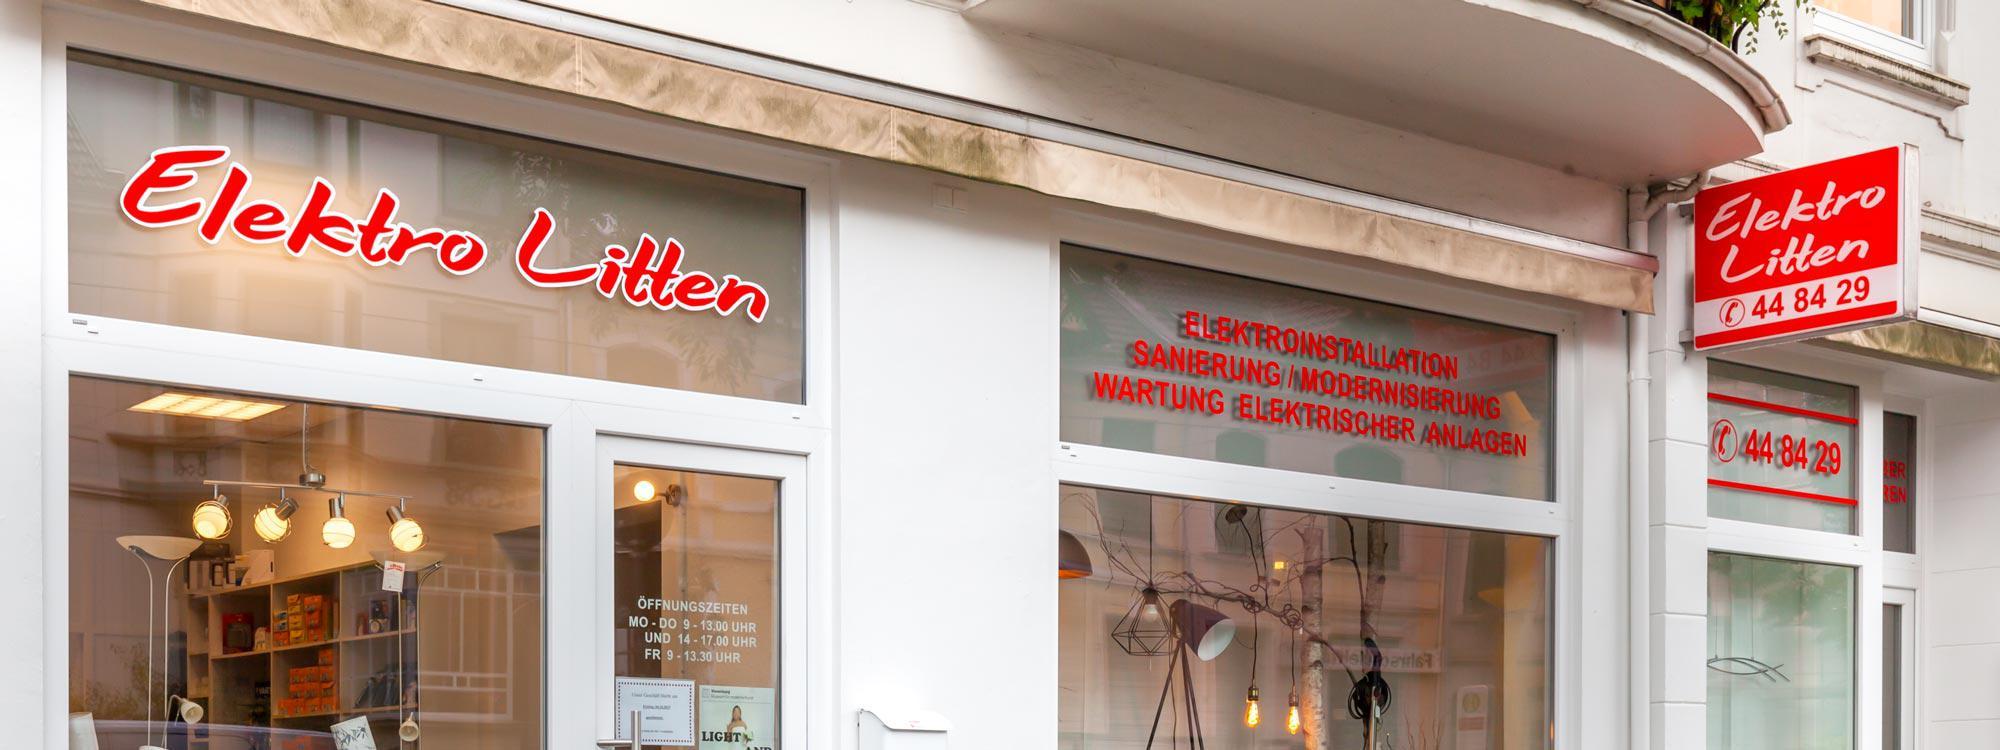 Elektro-Litten | Wolfgramm & Eikermann OHG